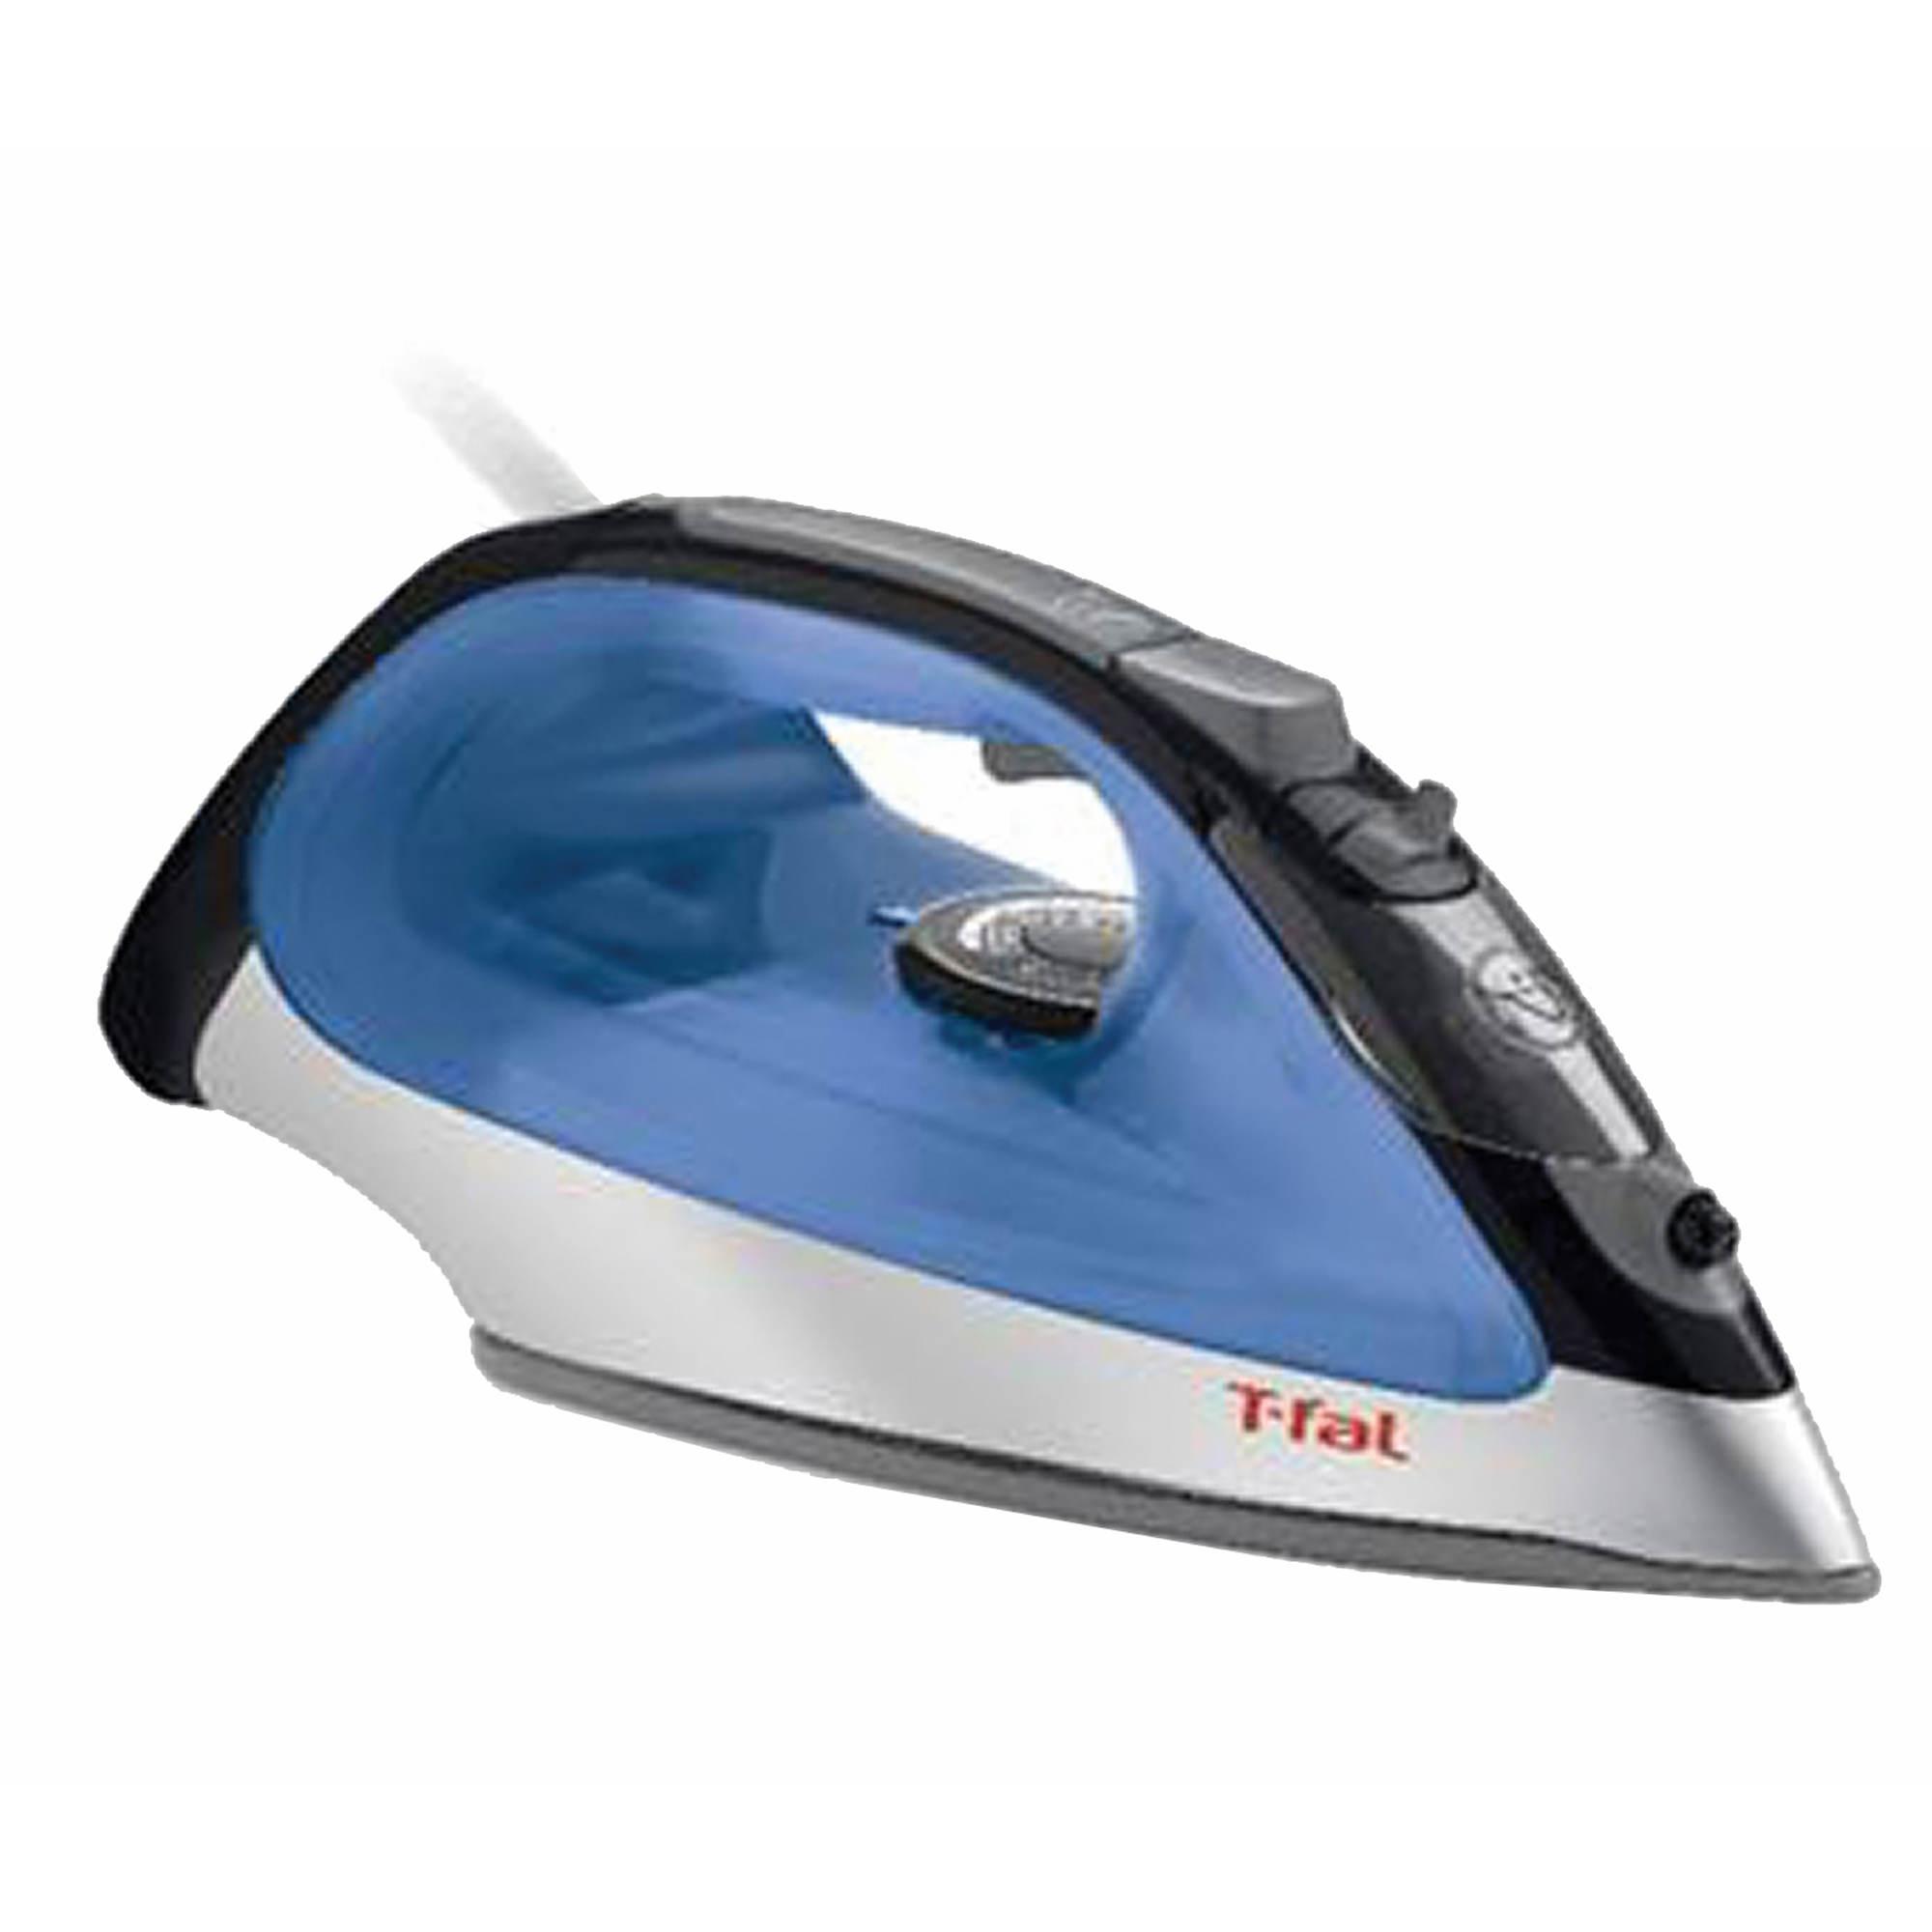 T-fal FV4494UO Ultraglide EasyCord Iron (Deep Blue)